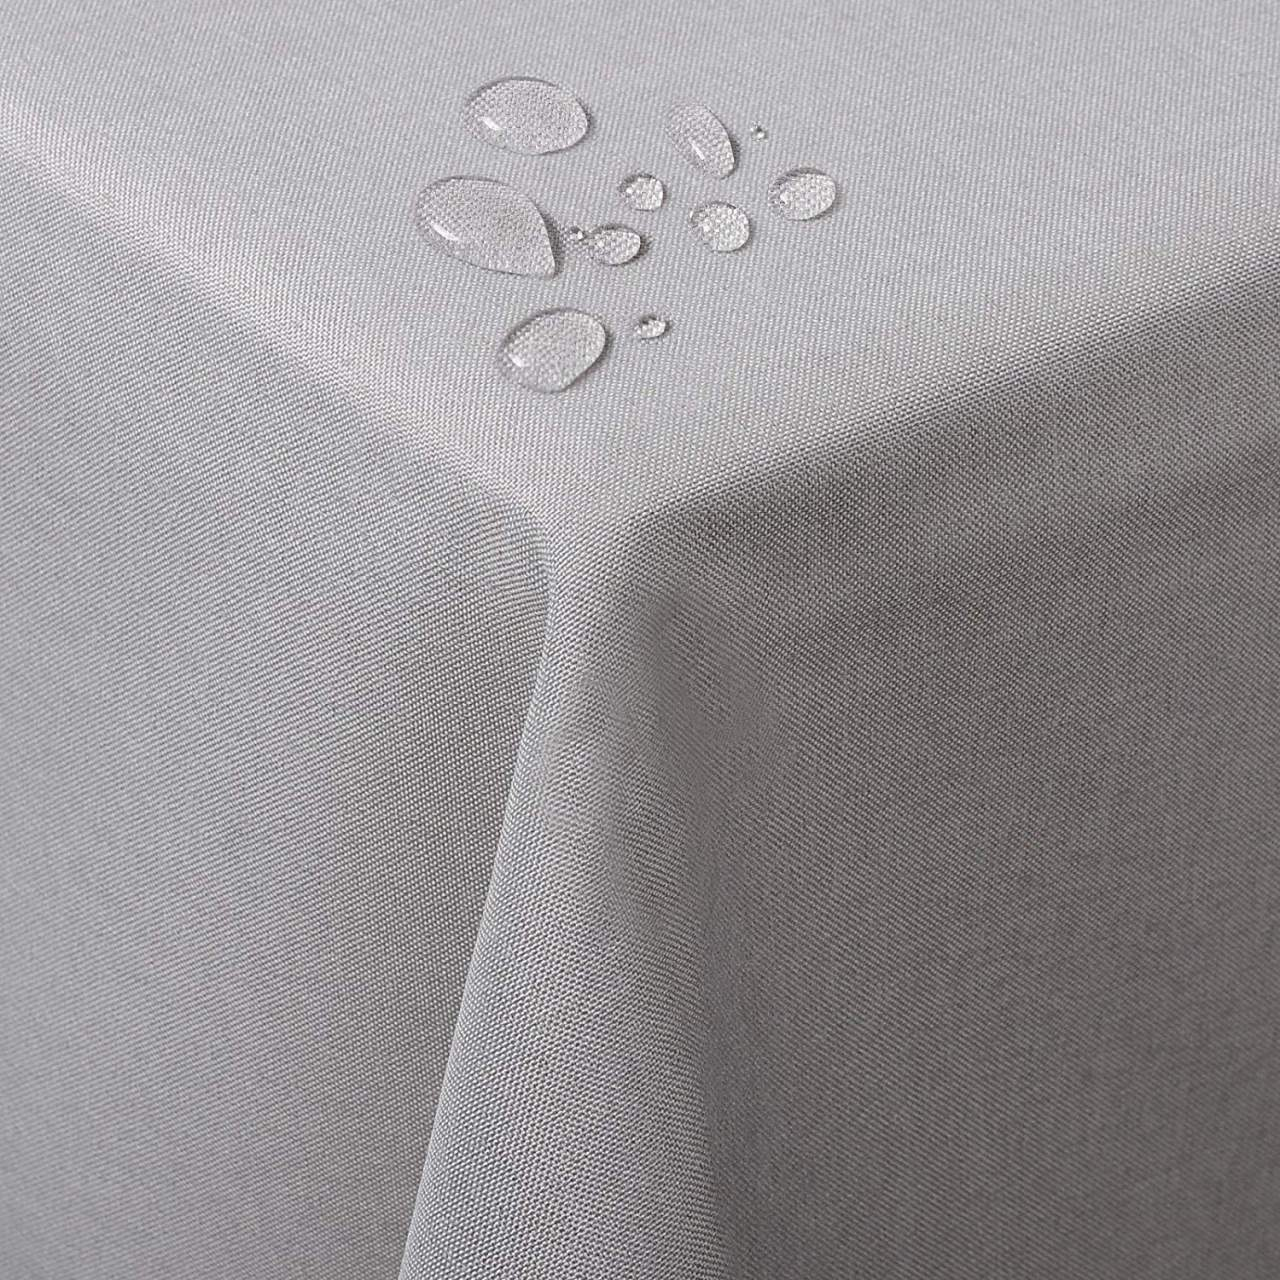 Mantel GRIS Claro Color Liso Rectangular 1,8x2,7m [enstockpara envíooretiro]